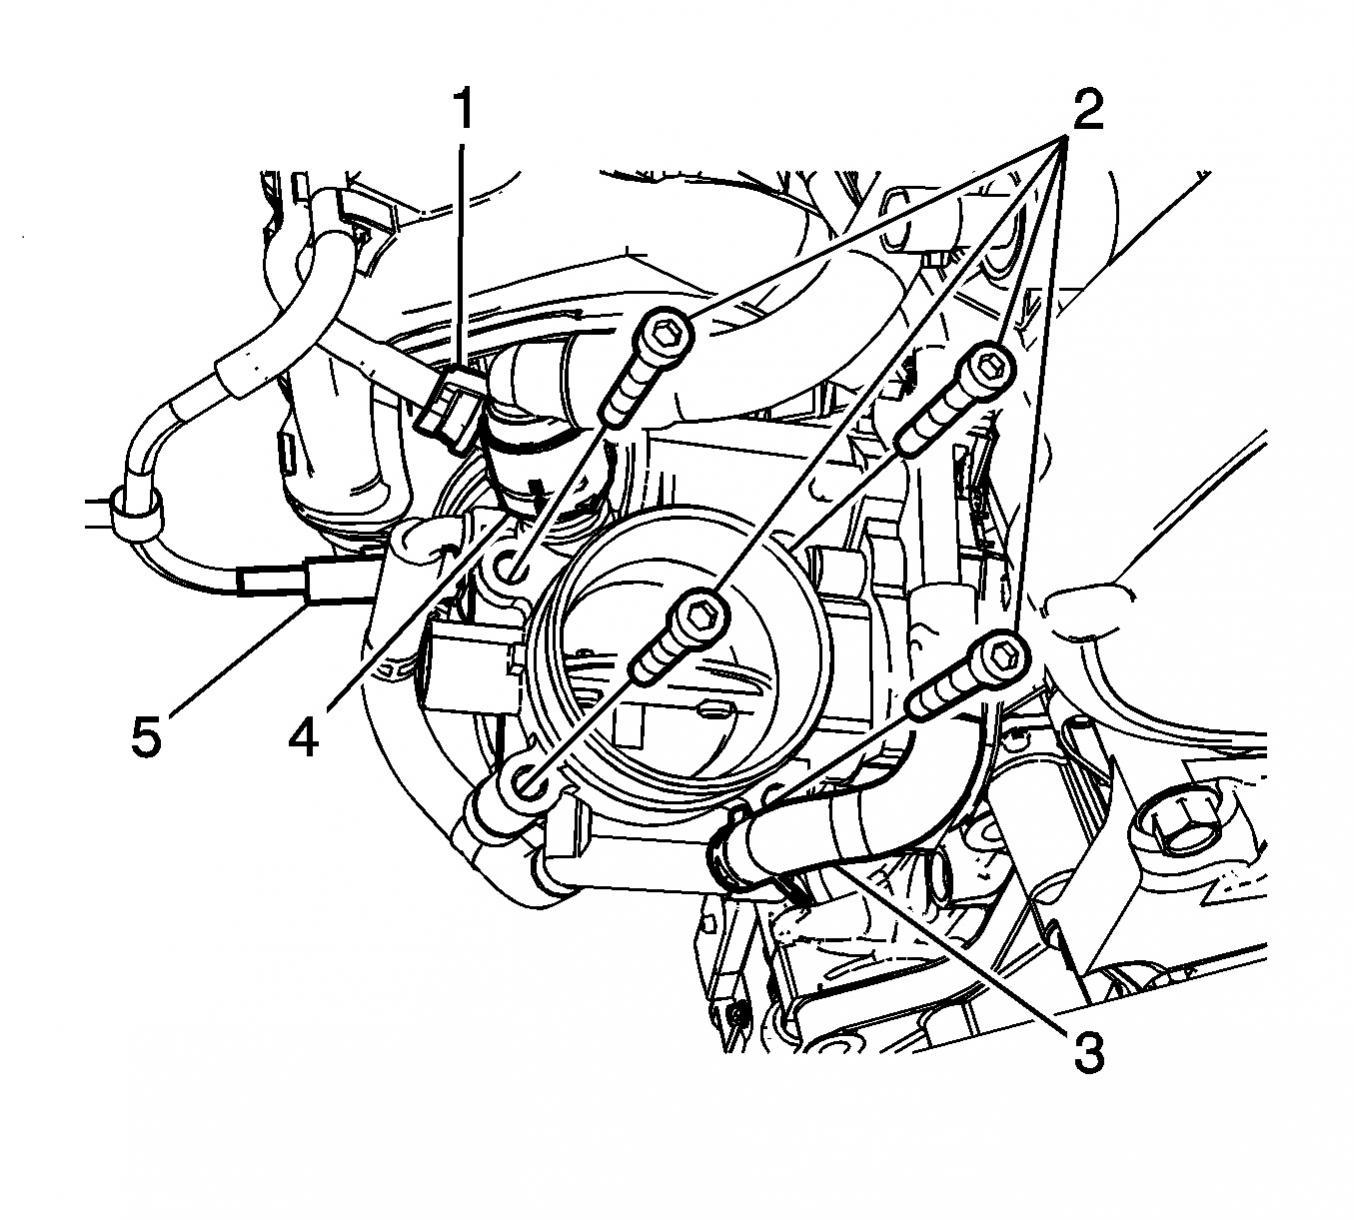 2011 chevy aveo5 engine diagram